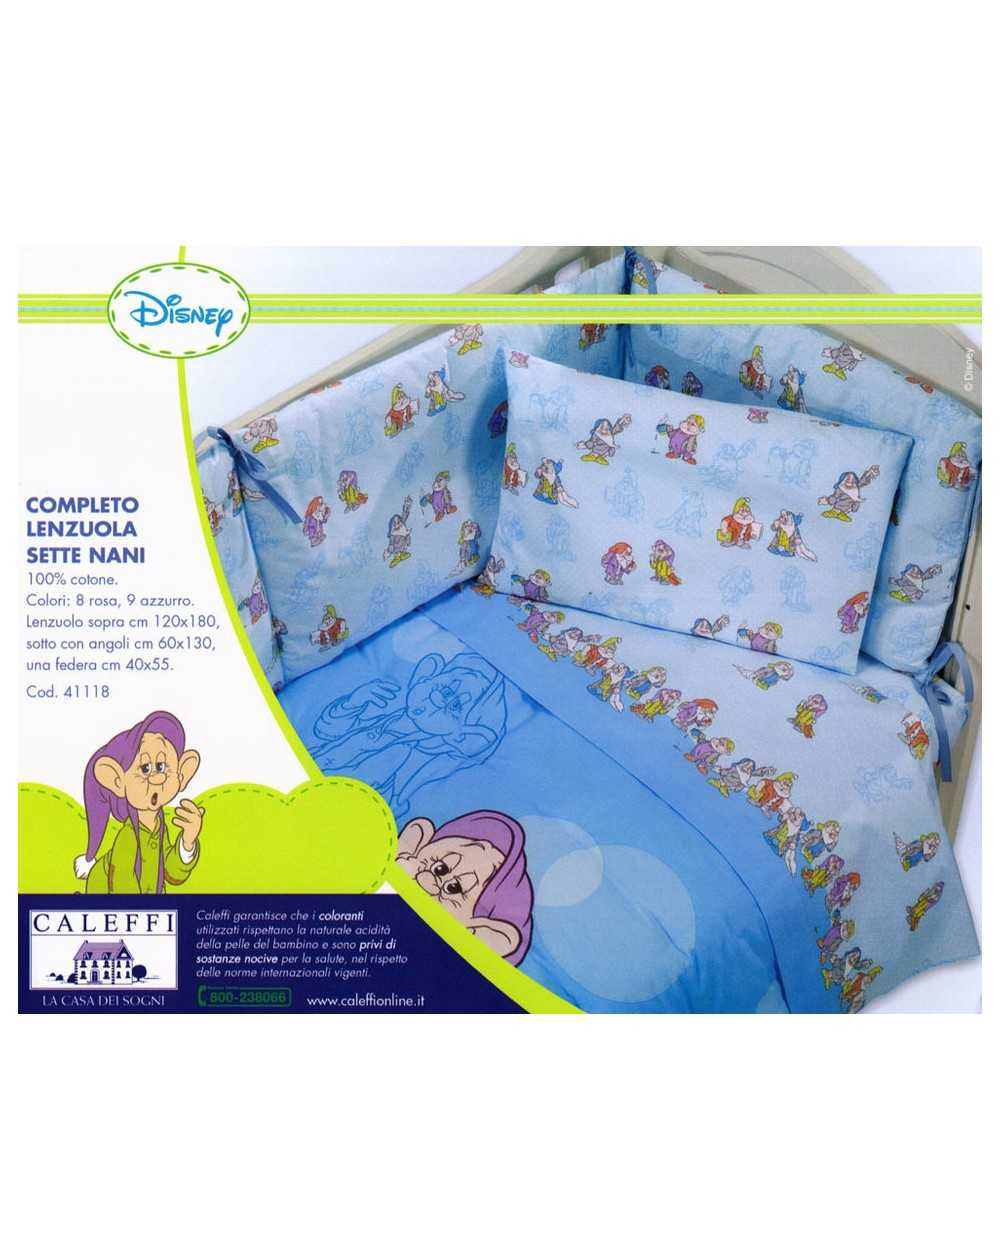 Baby Bedding Sheets Set Sleepy Seven Dwarfs